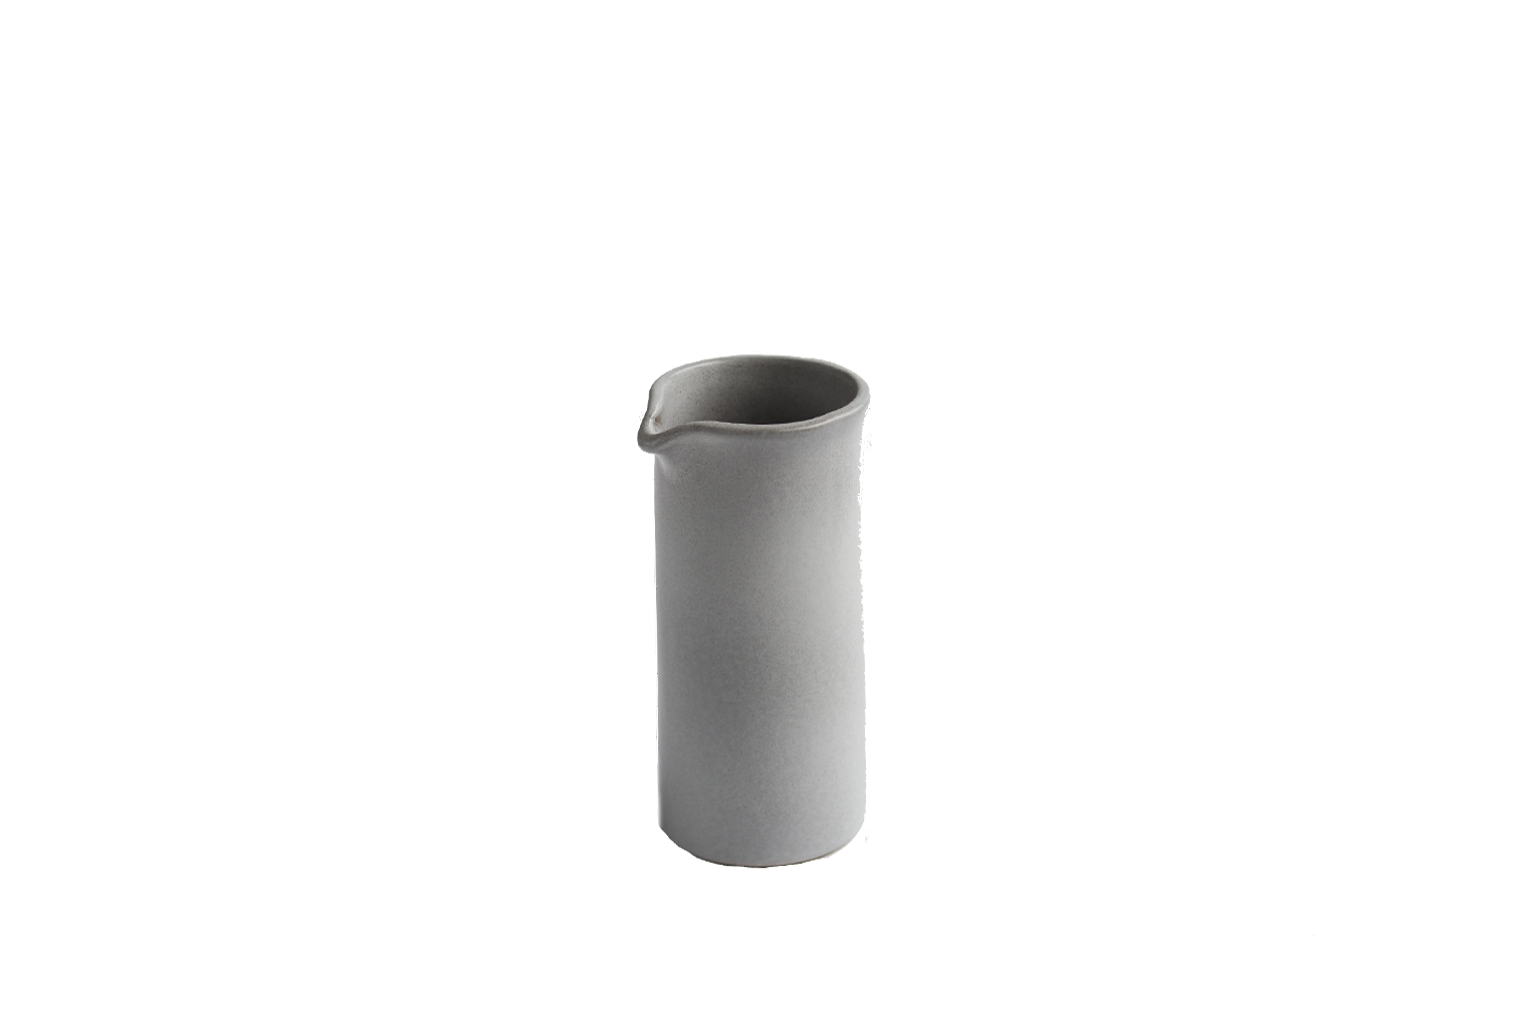 Minimalist Ceramic Jug - Medium - S$50